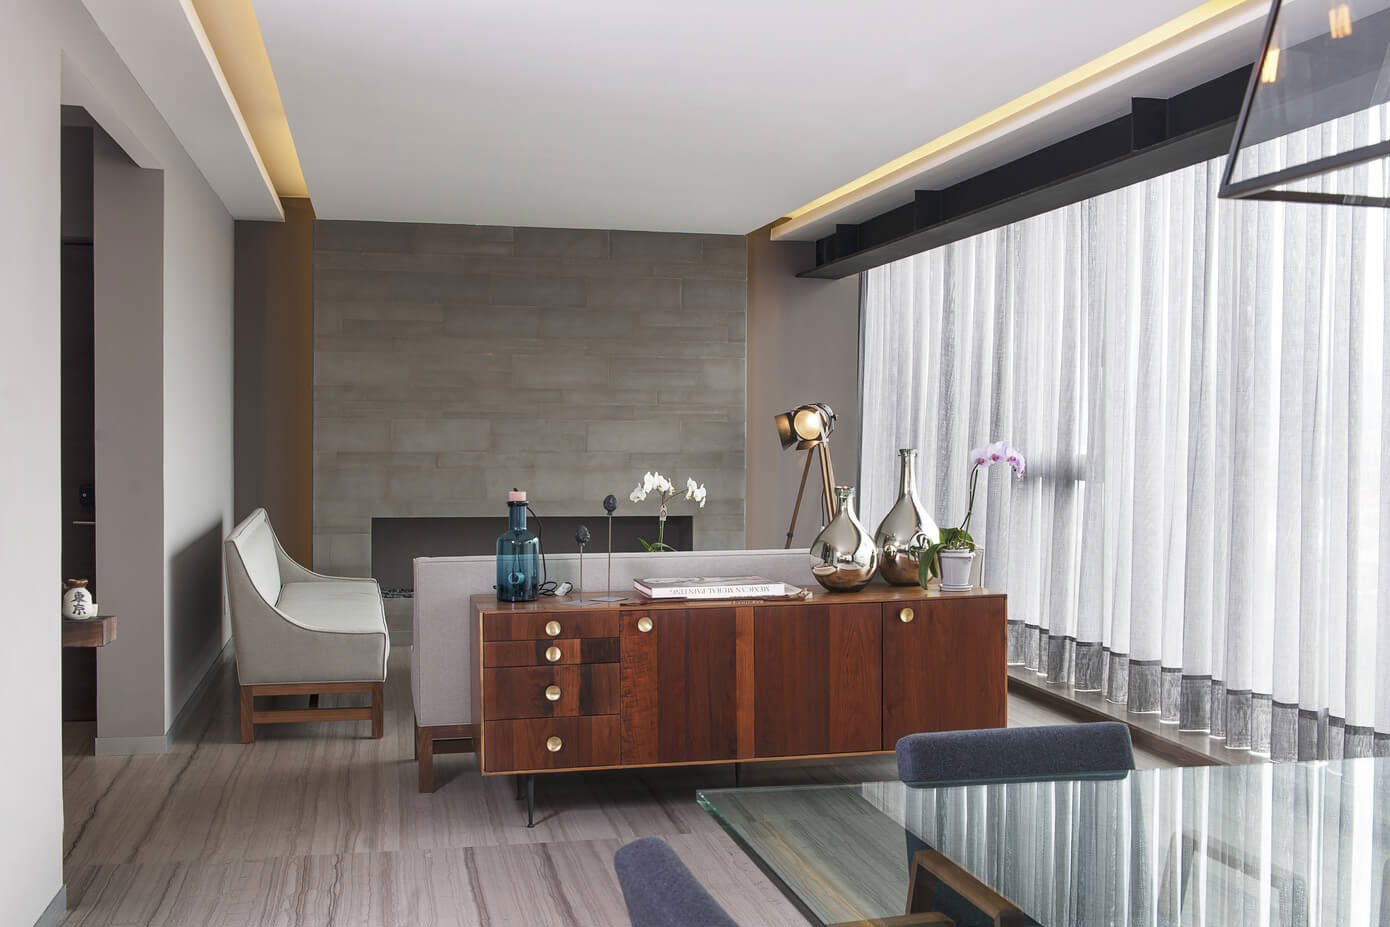 Contemporary CM Apartment in Mexico City by Kababie Arquitectos-05